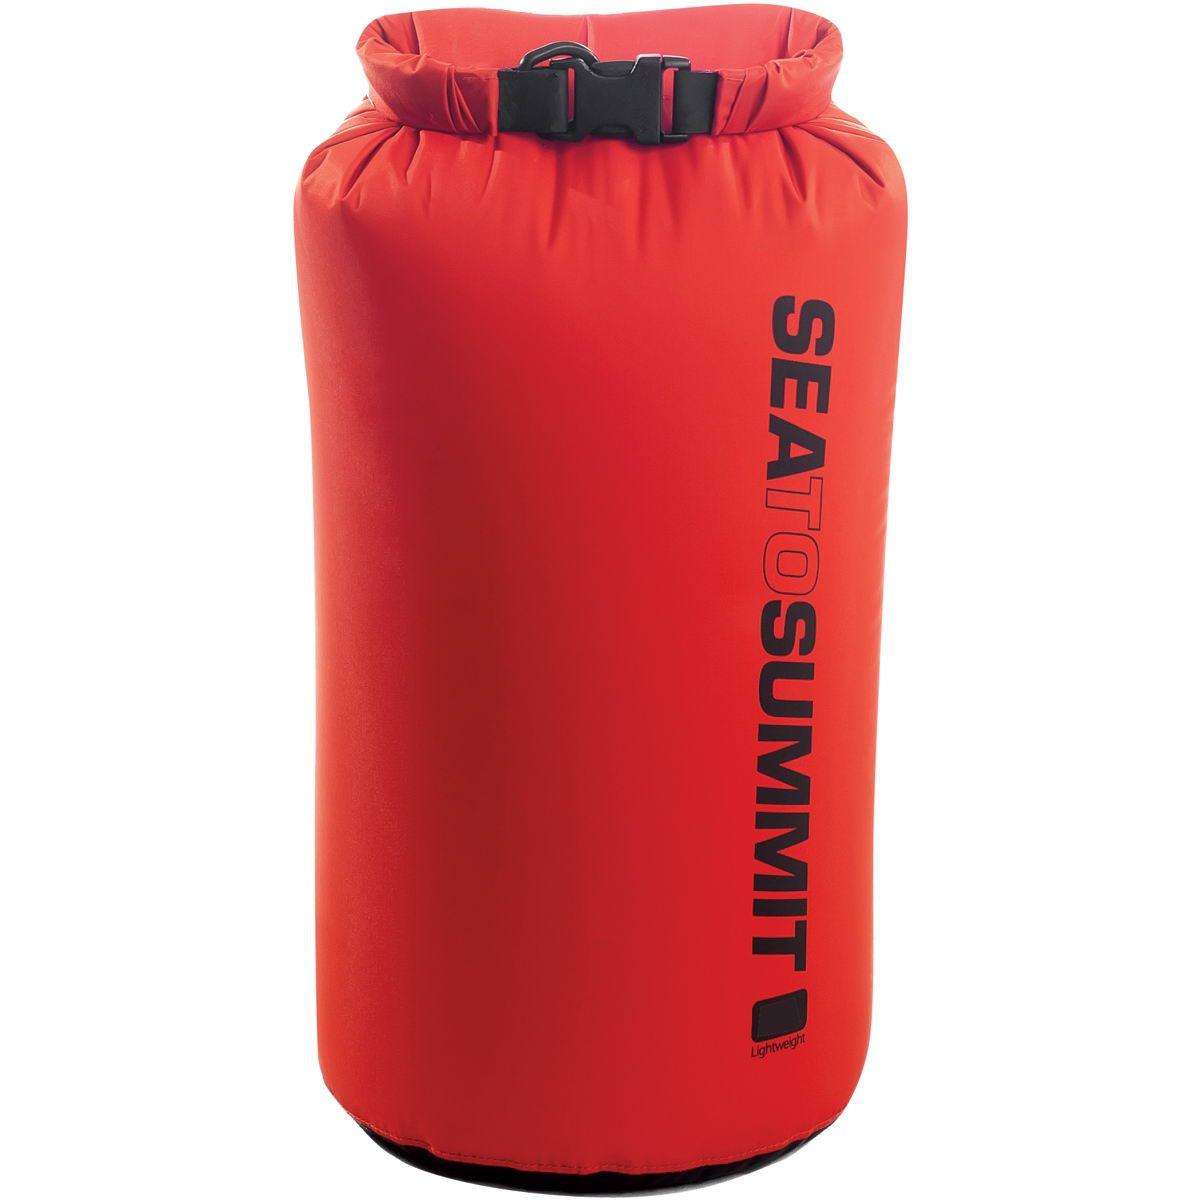 Sac impermeabil Lightweight Dry Sack Sea To Summit 35L - Rosu